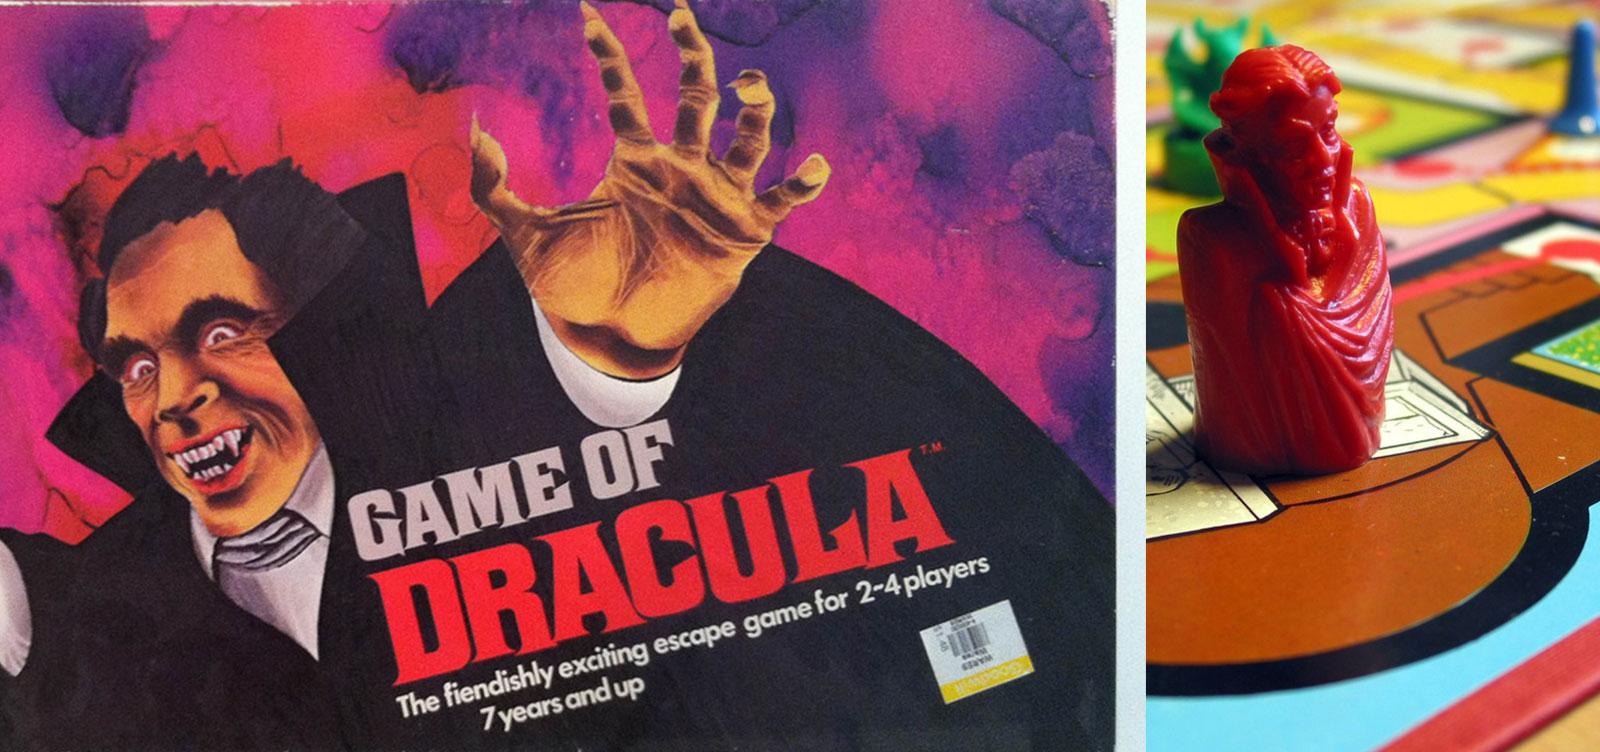 Game of Dracular